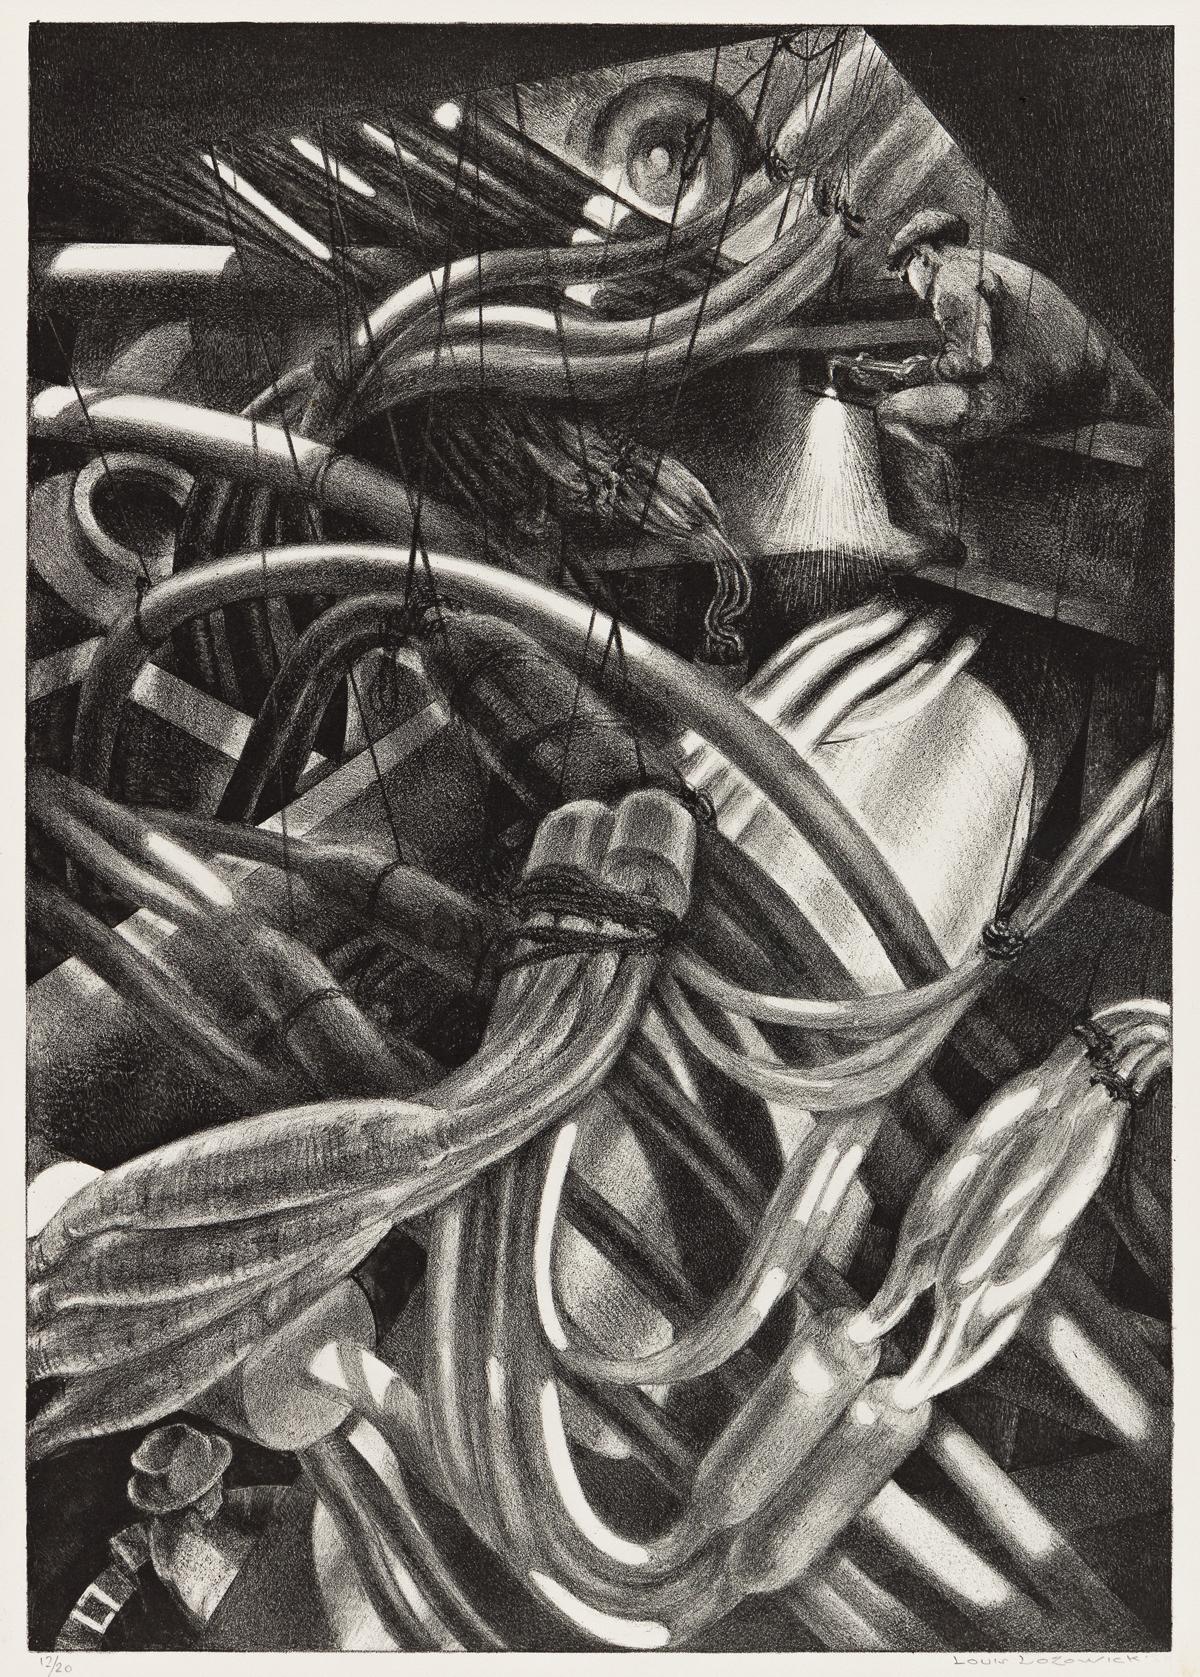 LOUIS LOZOWICK (1892-1973) Guts of Manhattan.